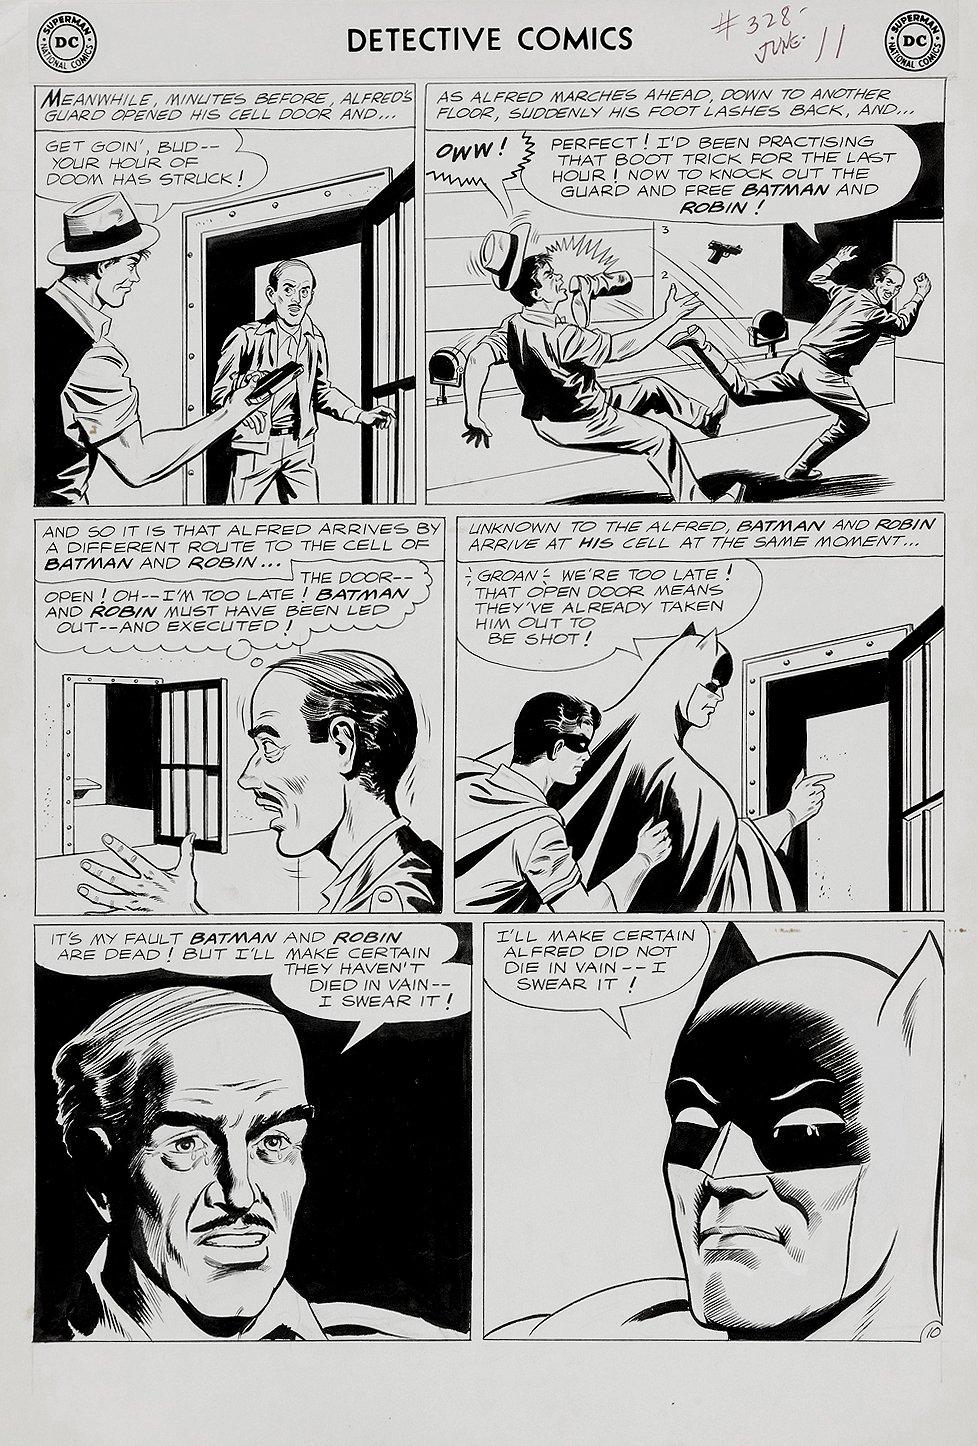 Detective Comics #328 p 10 (Large Art) 1964